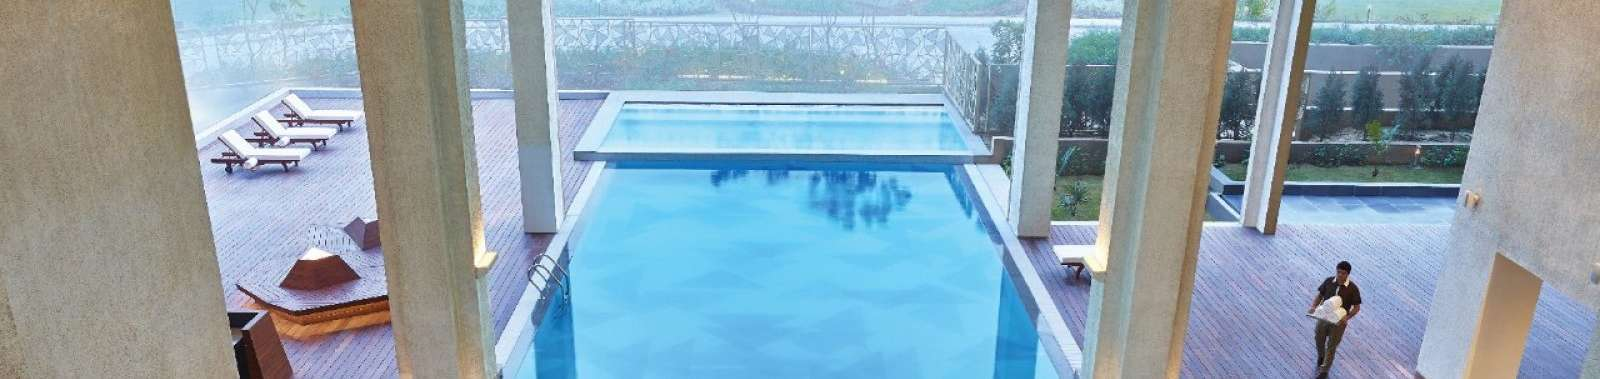 Vivanta by Taj – Dwarka - the best-located luxury hotel for Delhi airport